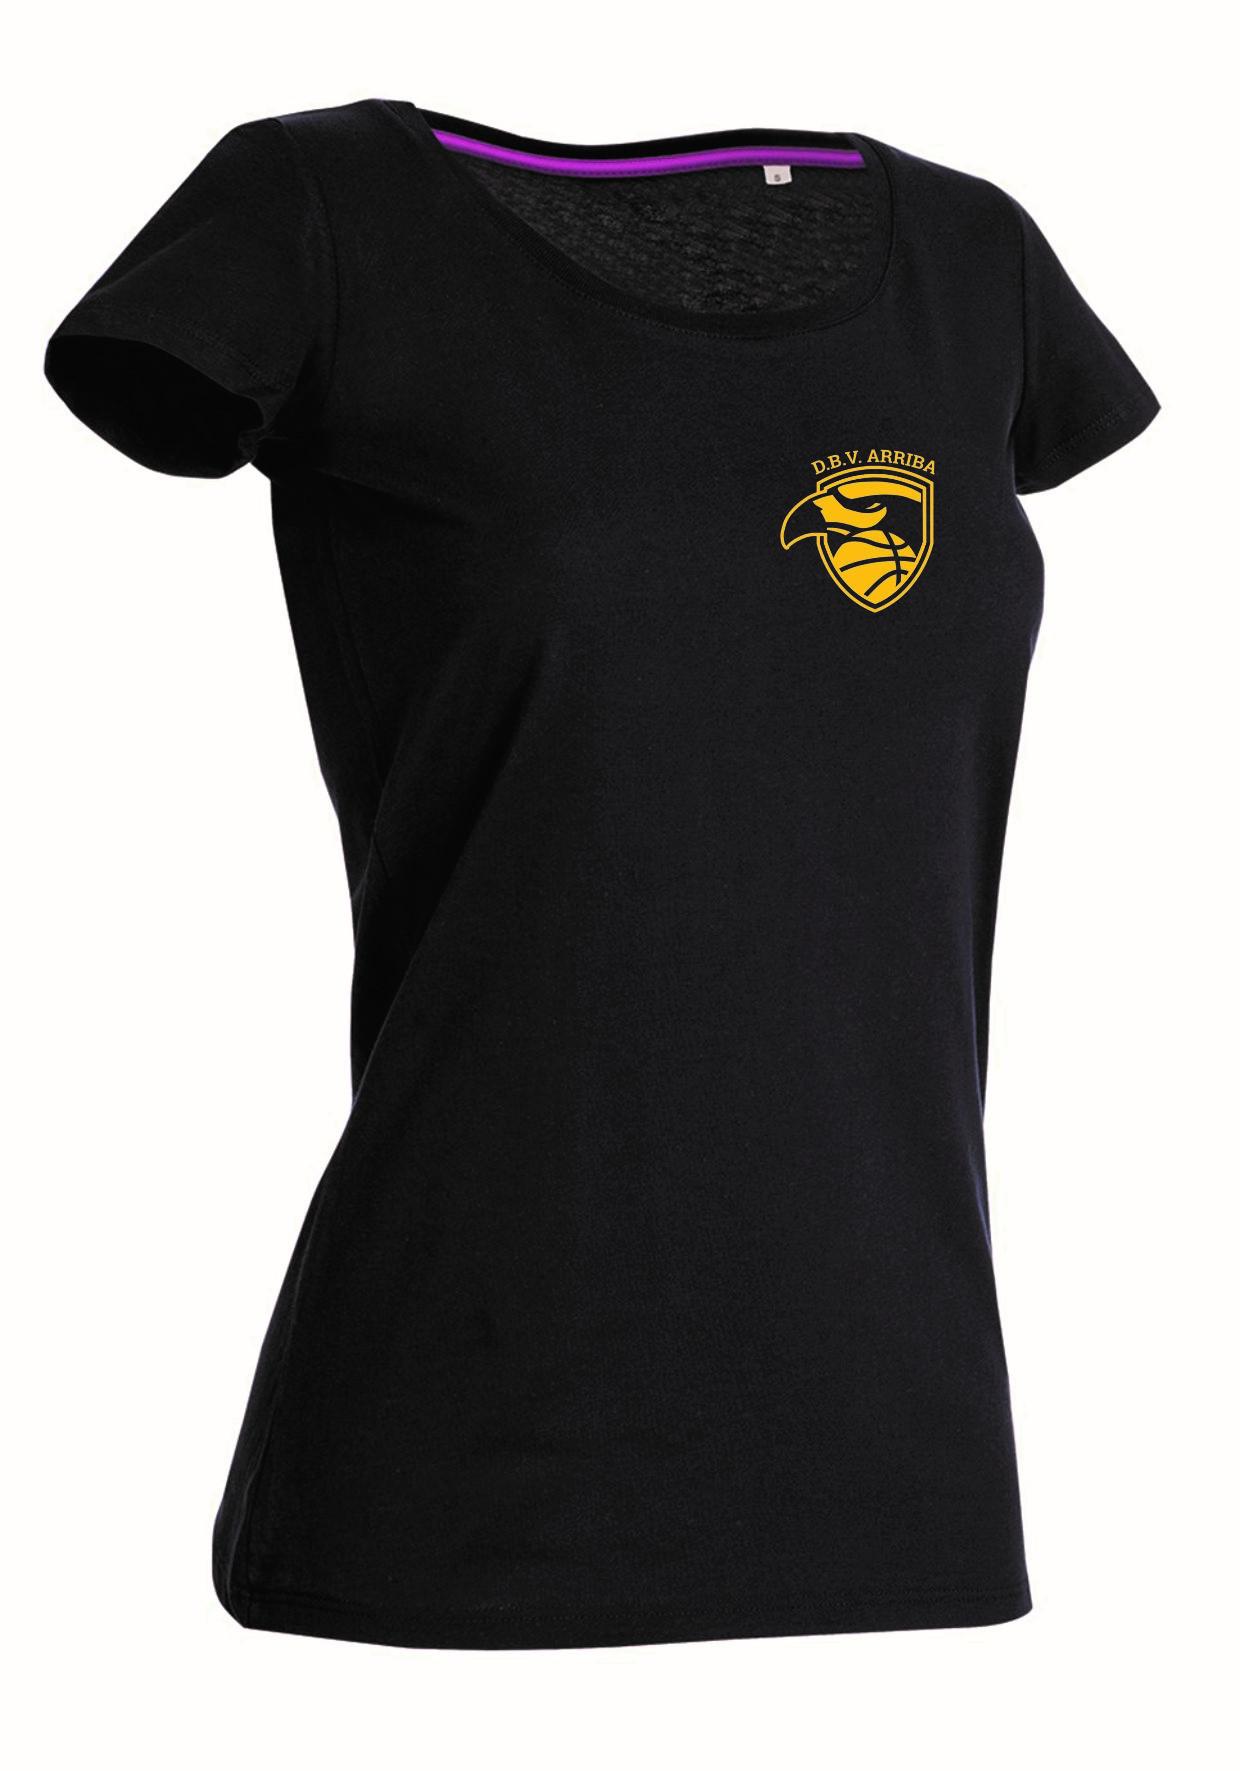 T-shirt women (small logo) Image